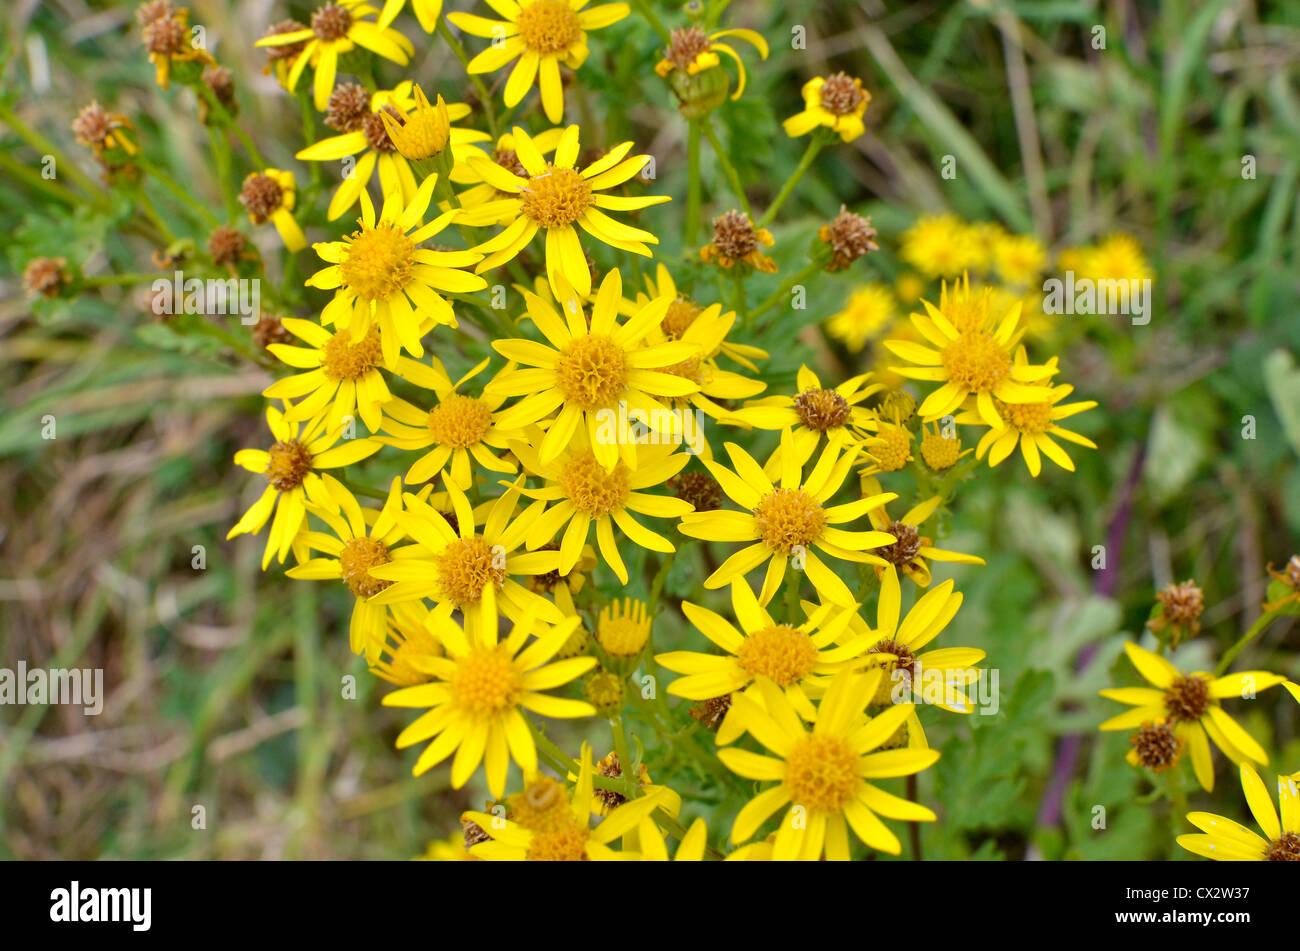 Senecio Jacobaea Yellow Flower Flowers Poisonous Plant Plants Stock